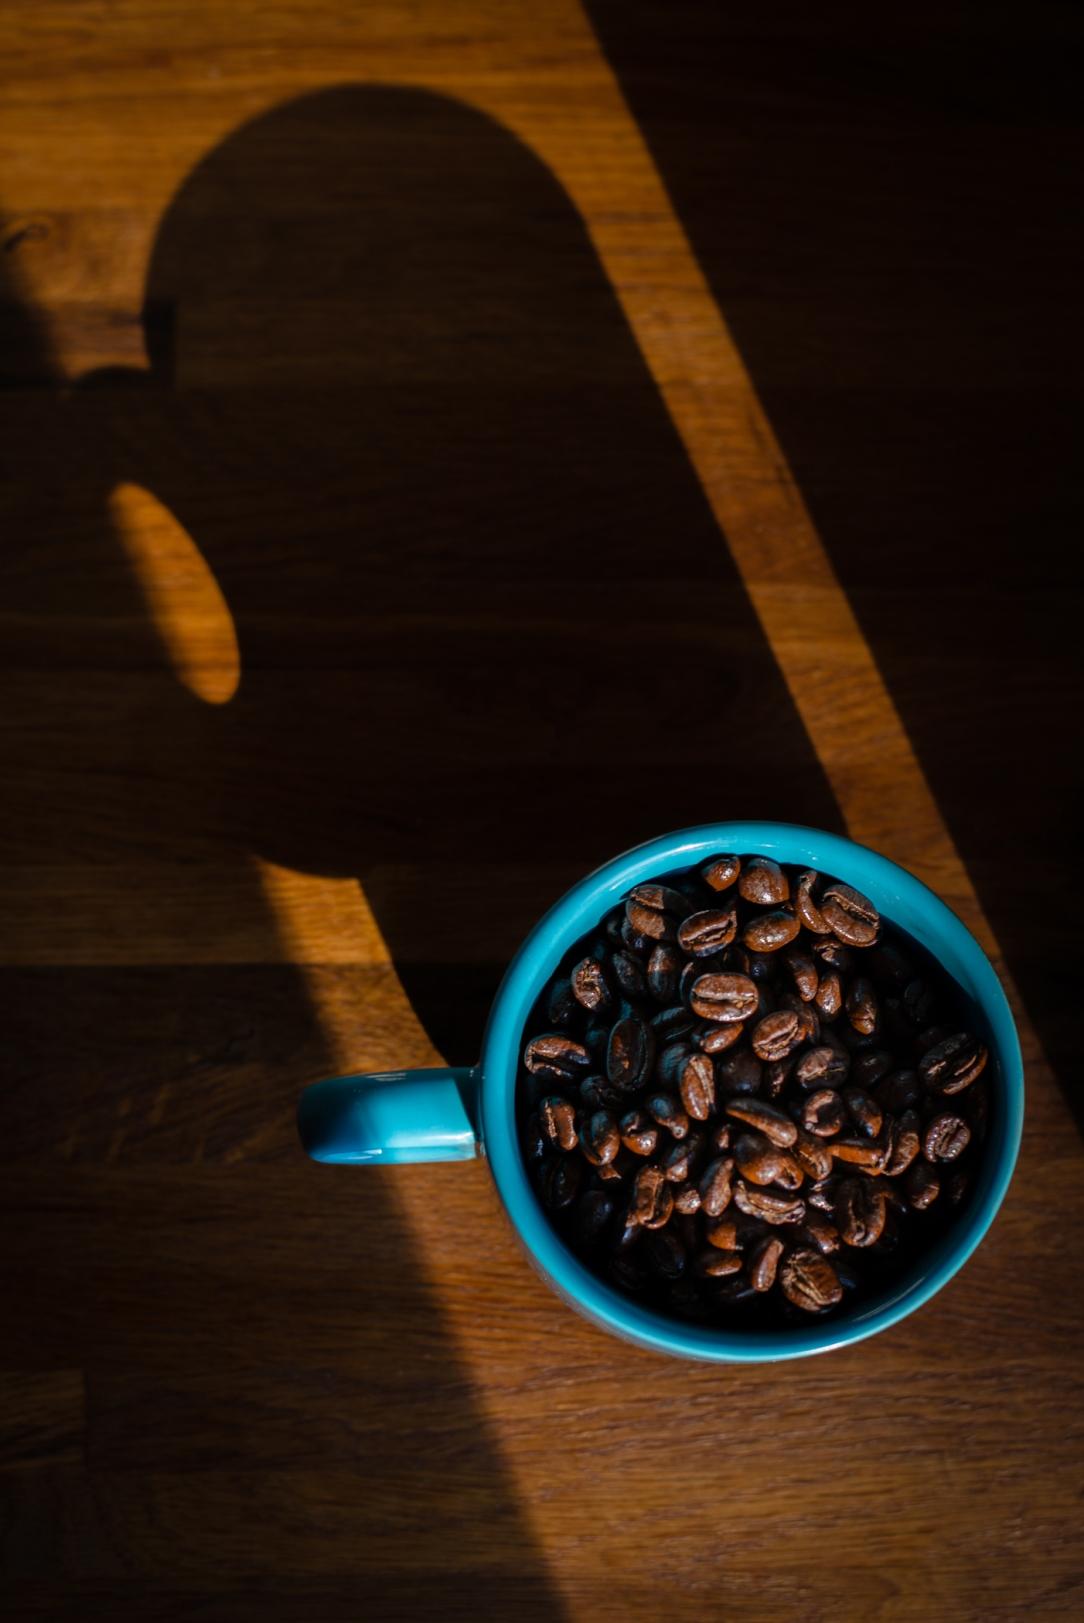 alpha-brew-coffee-jamie-bannon-photography_7173